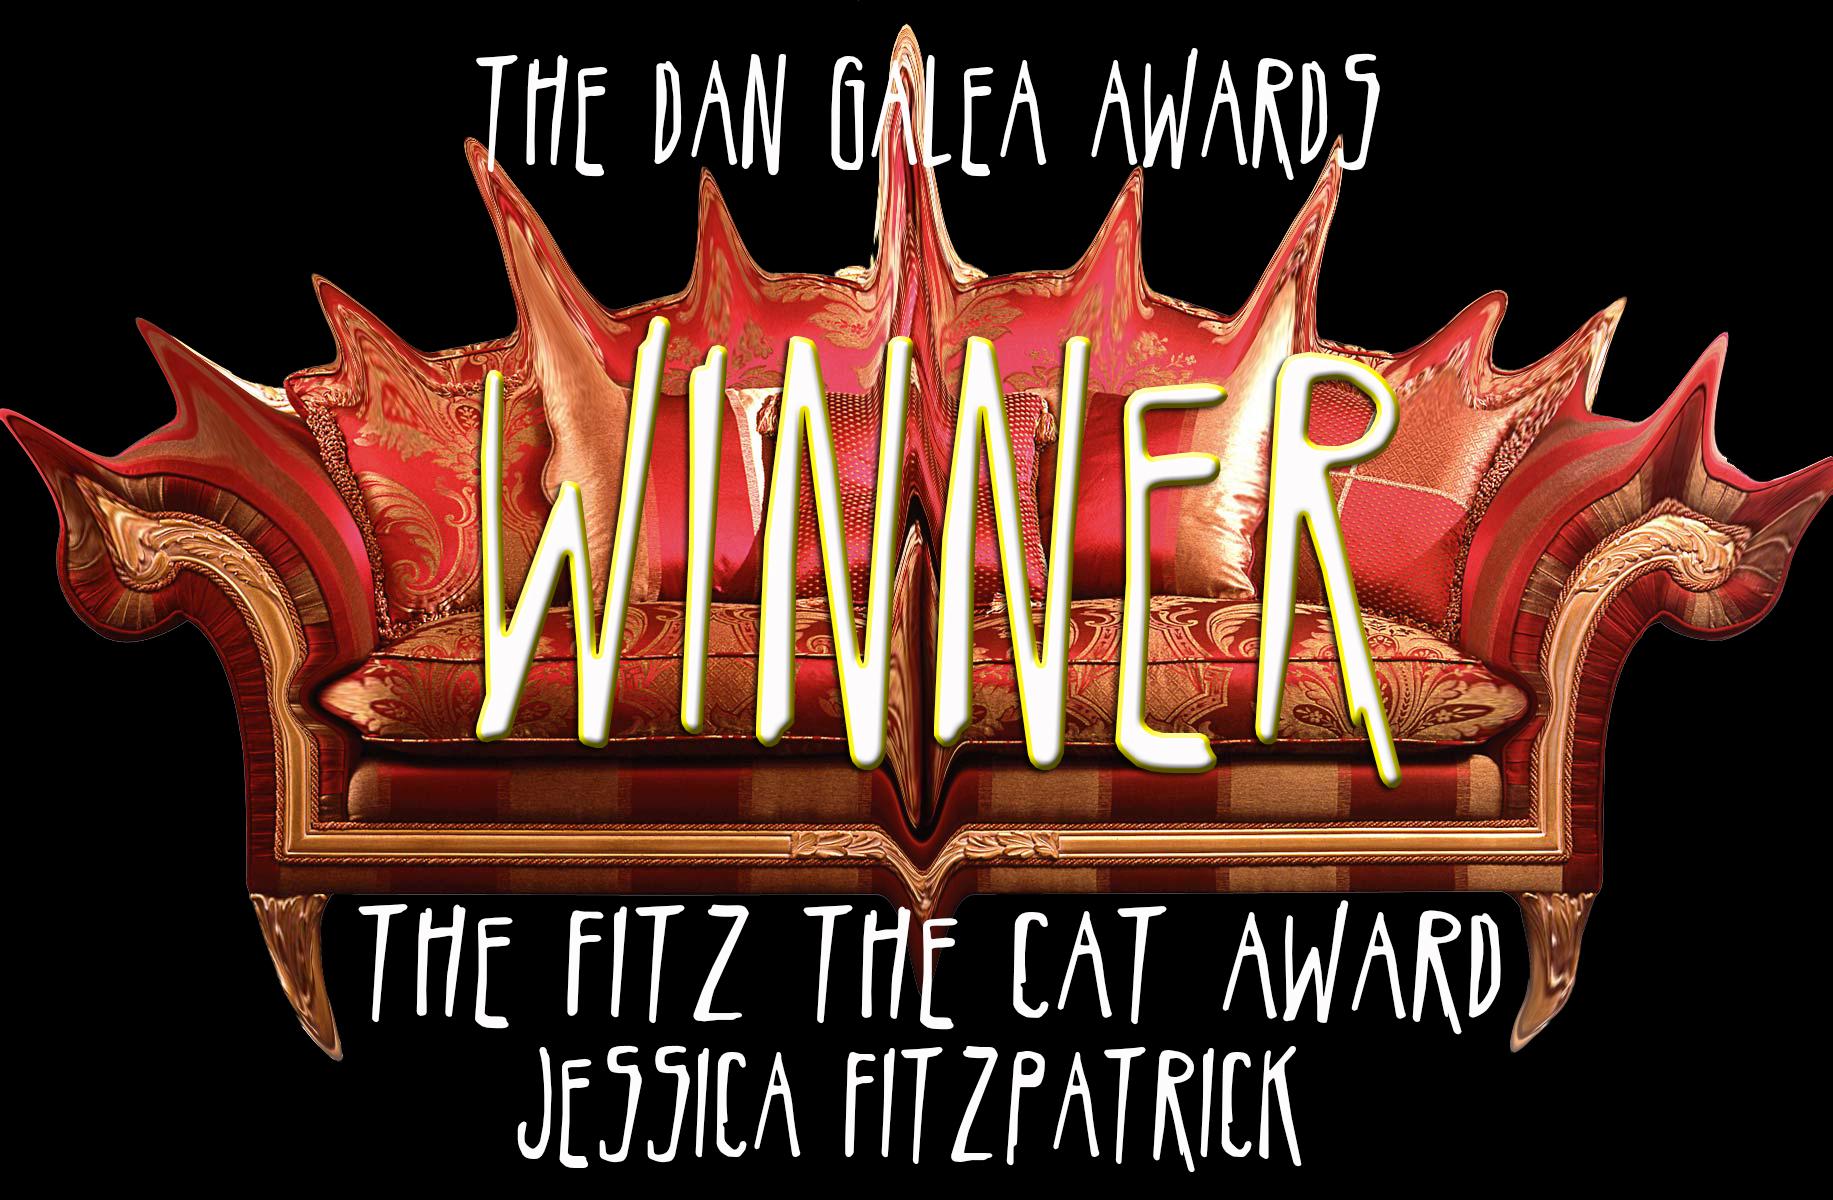 DGawards Jessica Fitzpatrick.jpg